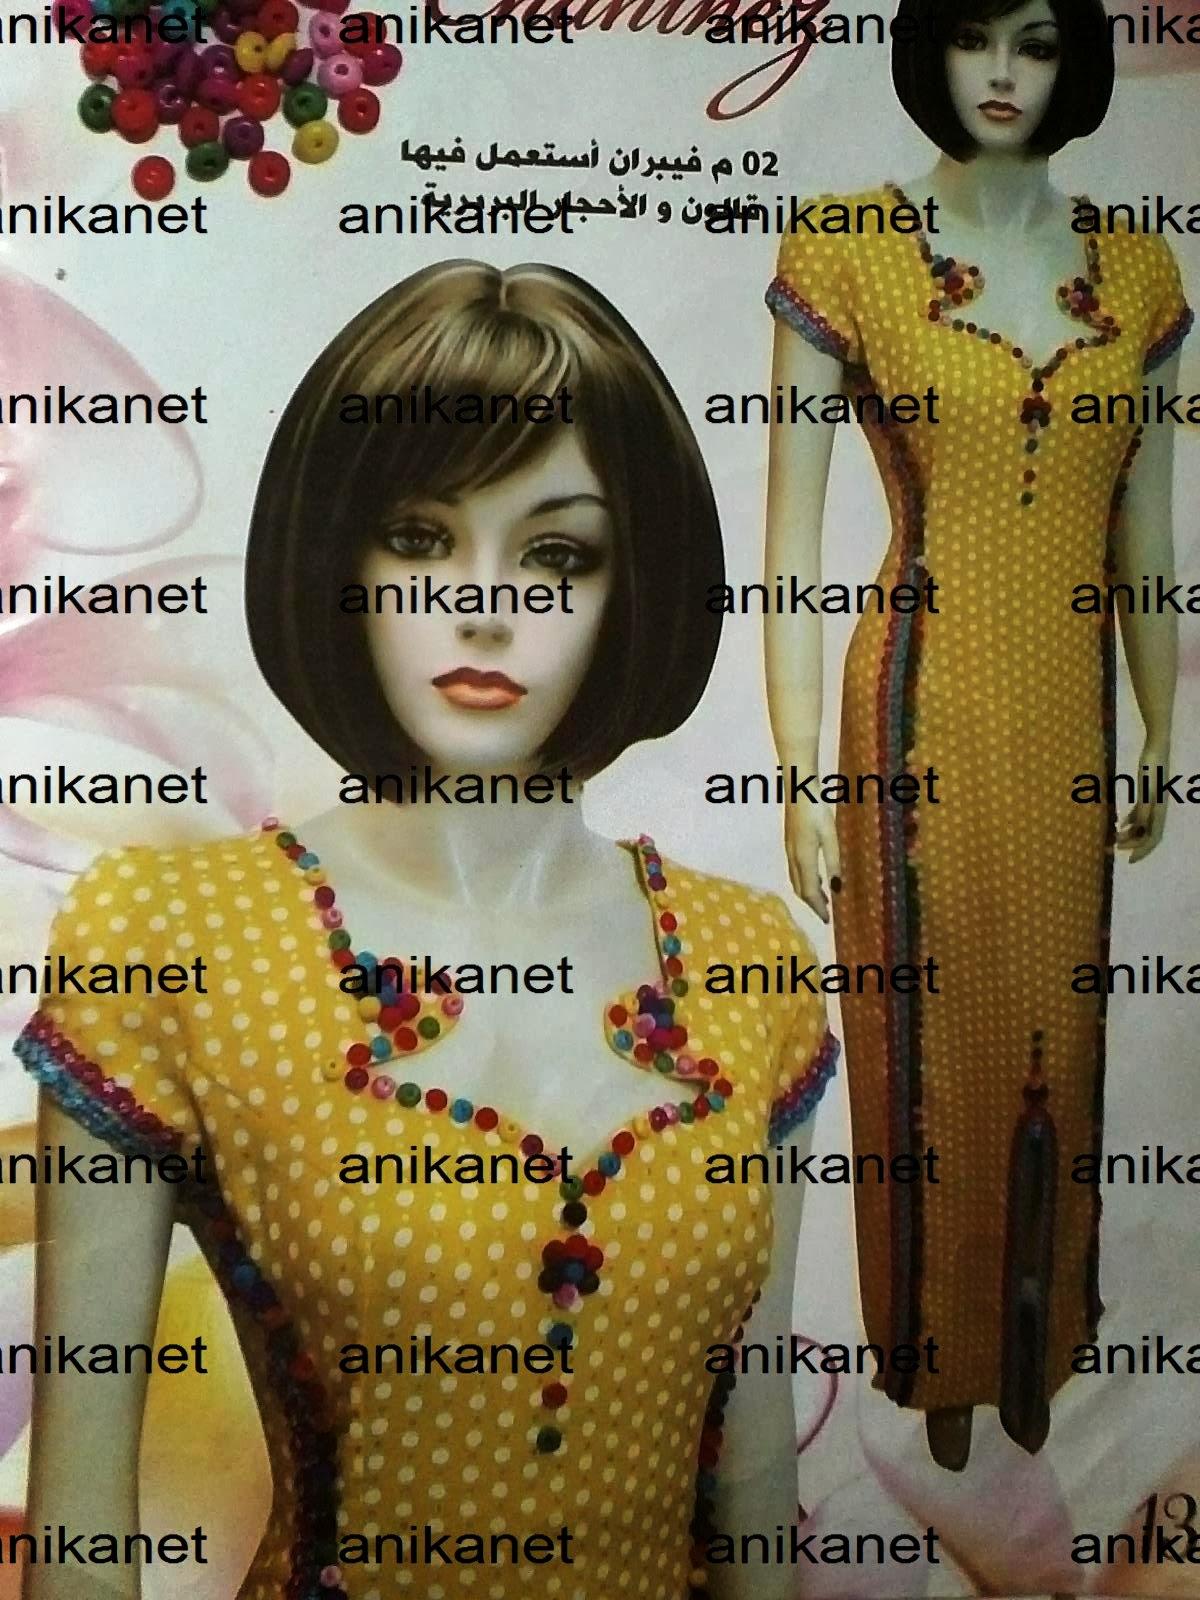 robe katifa chahinez n°12 été 2013 collection 2 ~ anikanet gnader